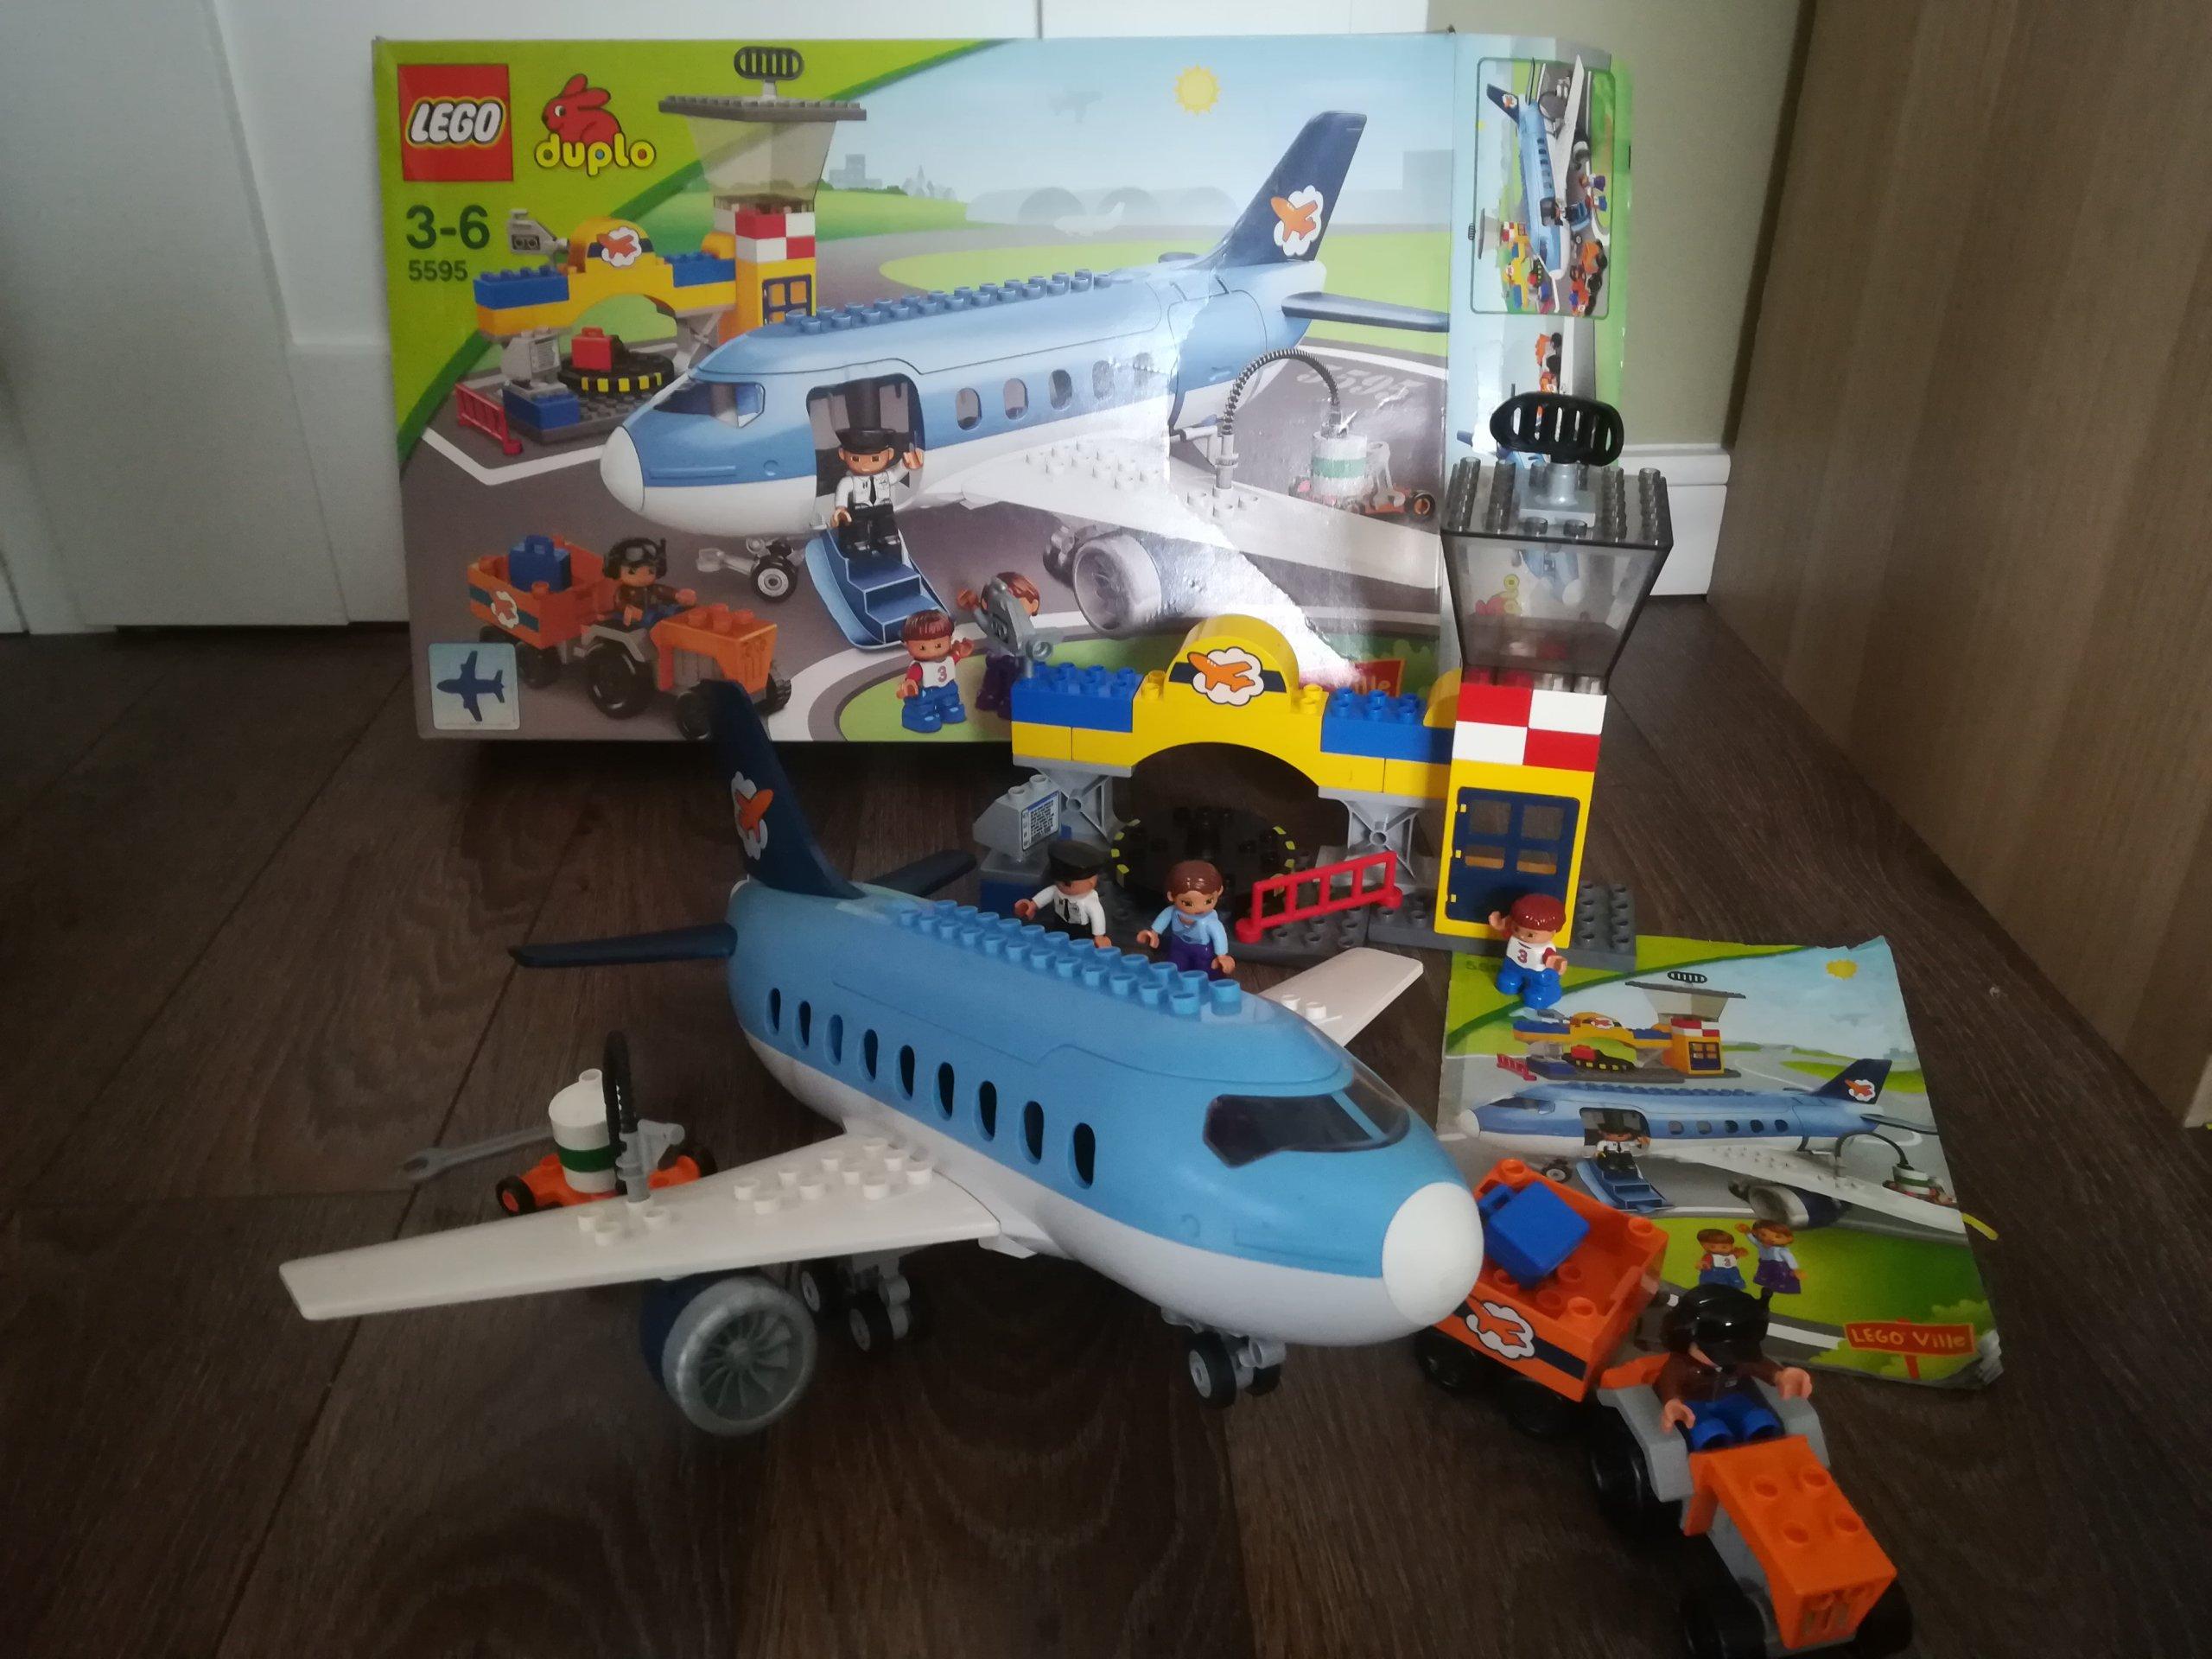 Lego Duplo Lotnisko Samolot Pasażerski 5595 7272587446